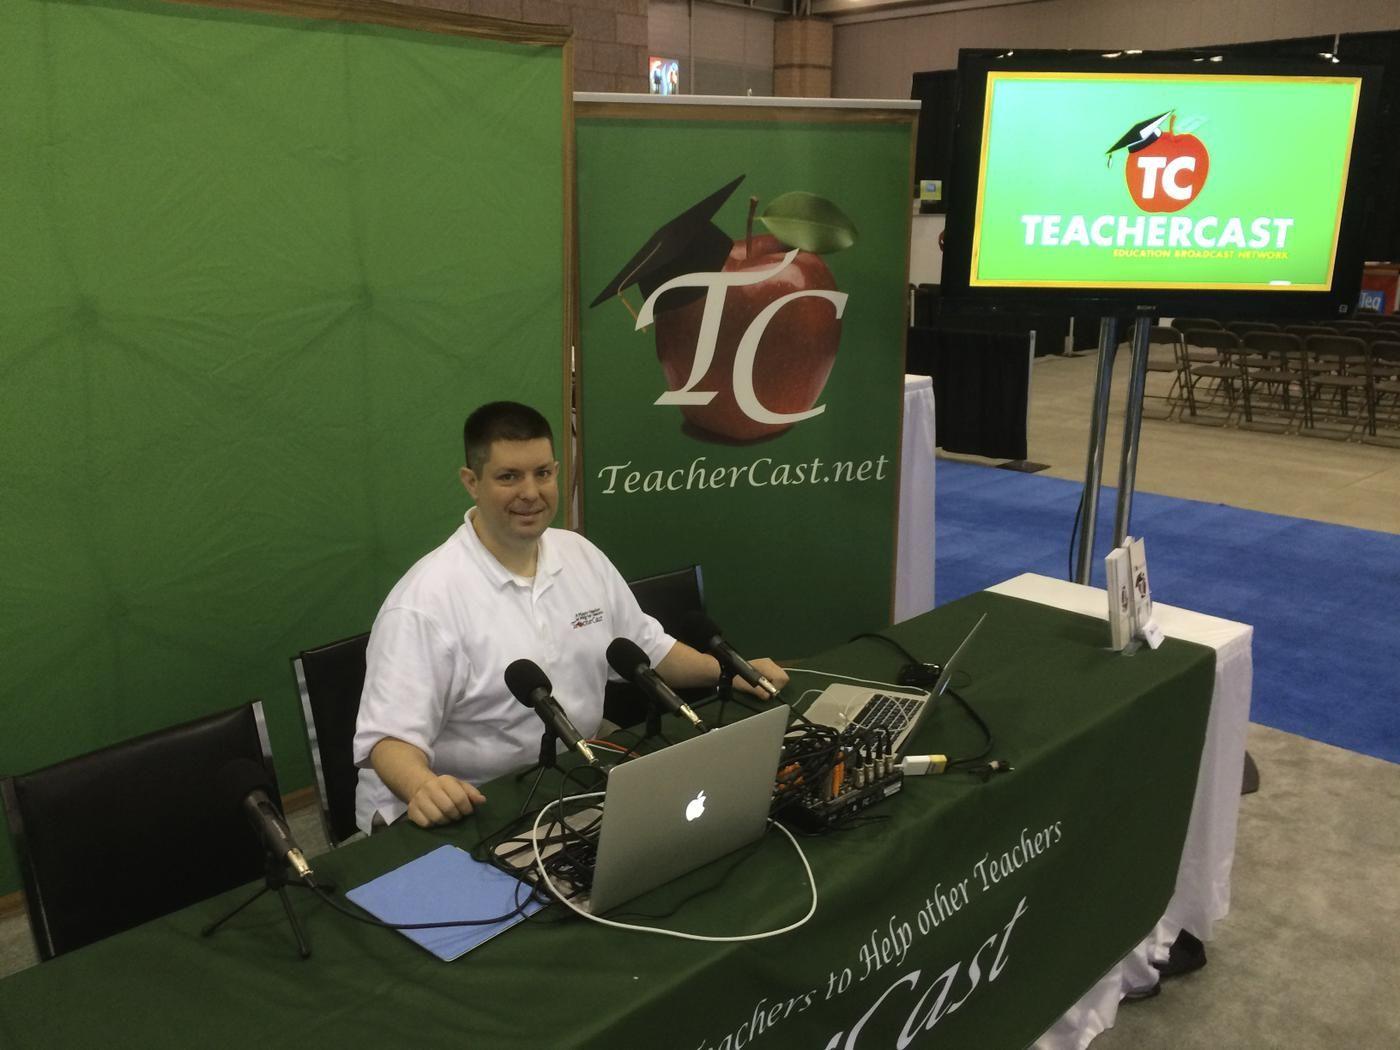 The TeacherCast Educational Network